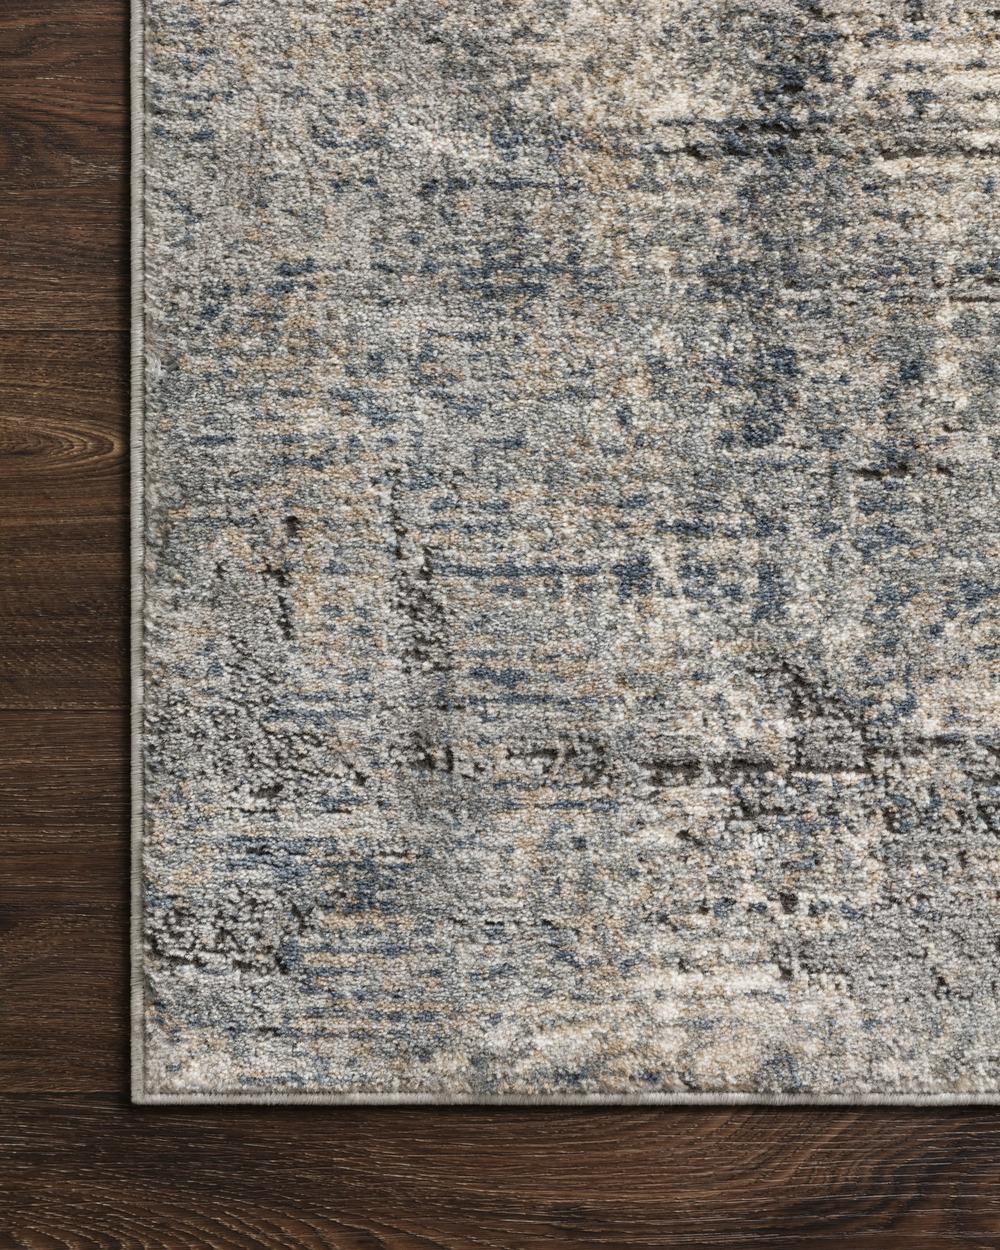 Loloi Rugs - Teagan Rug (Denim/Slate)